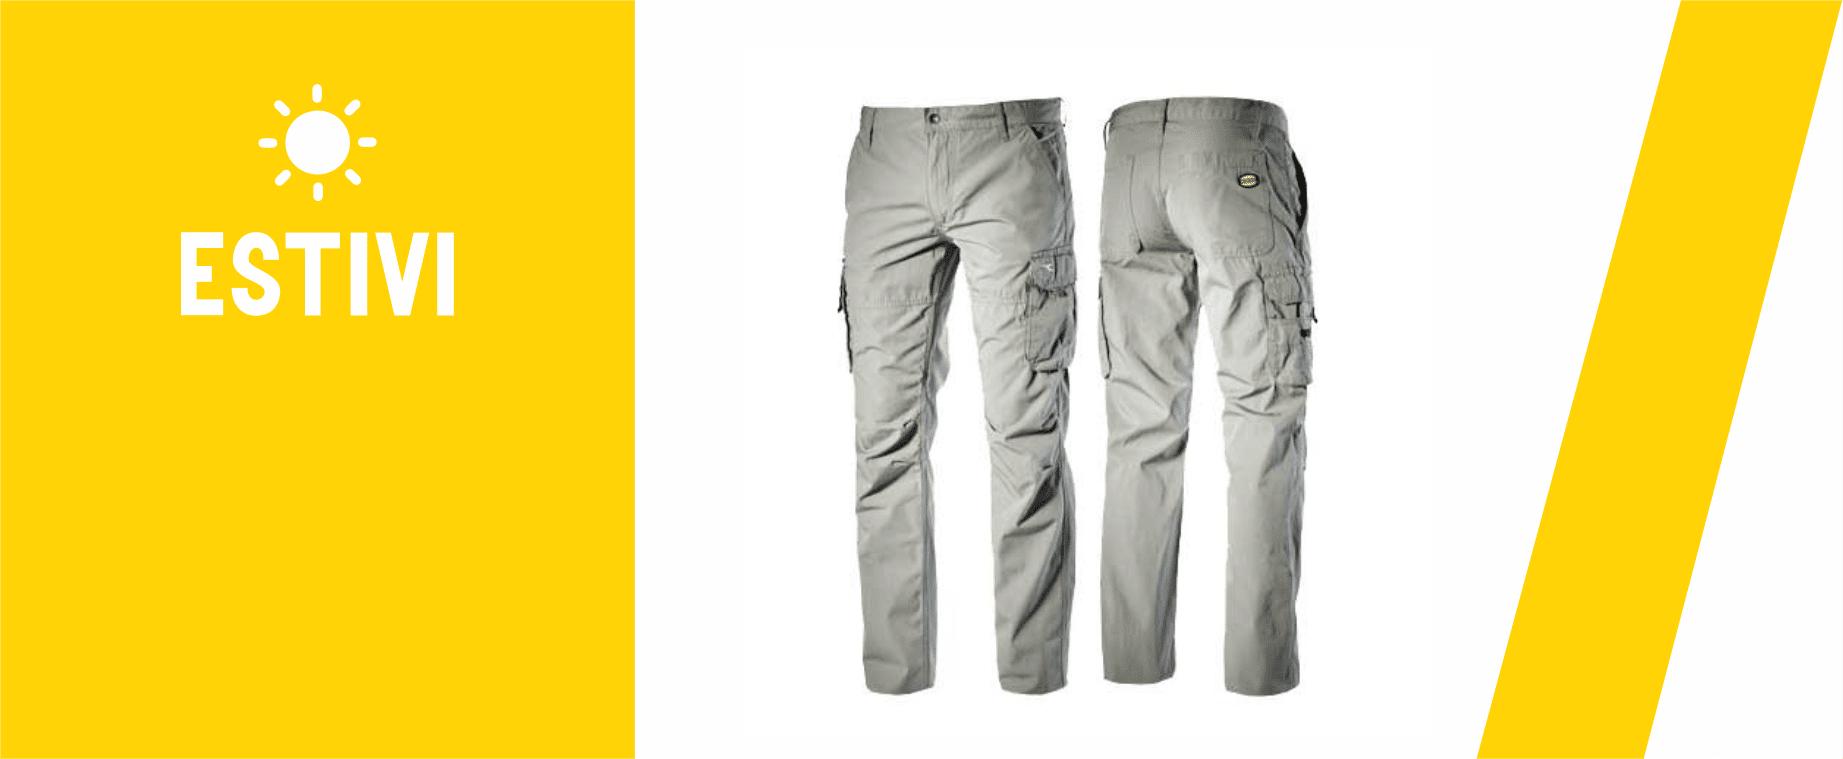 Pantaloni da lavoro estivi